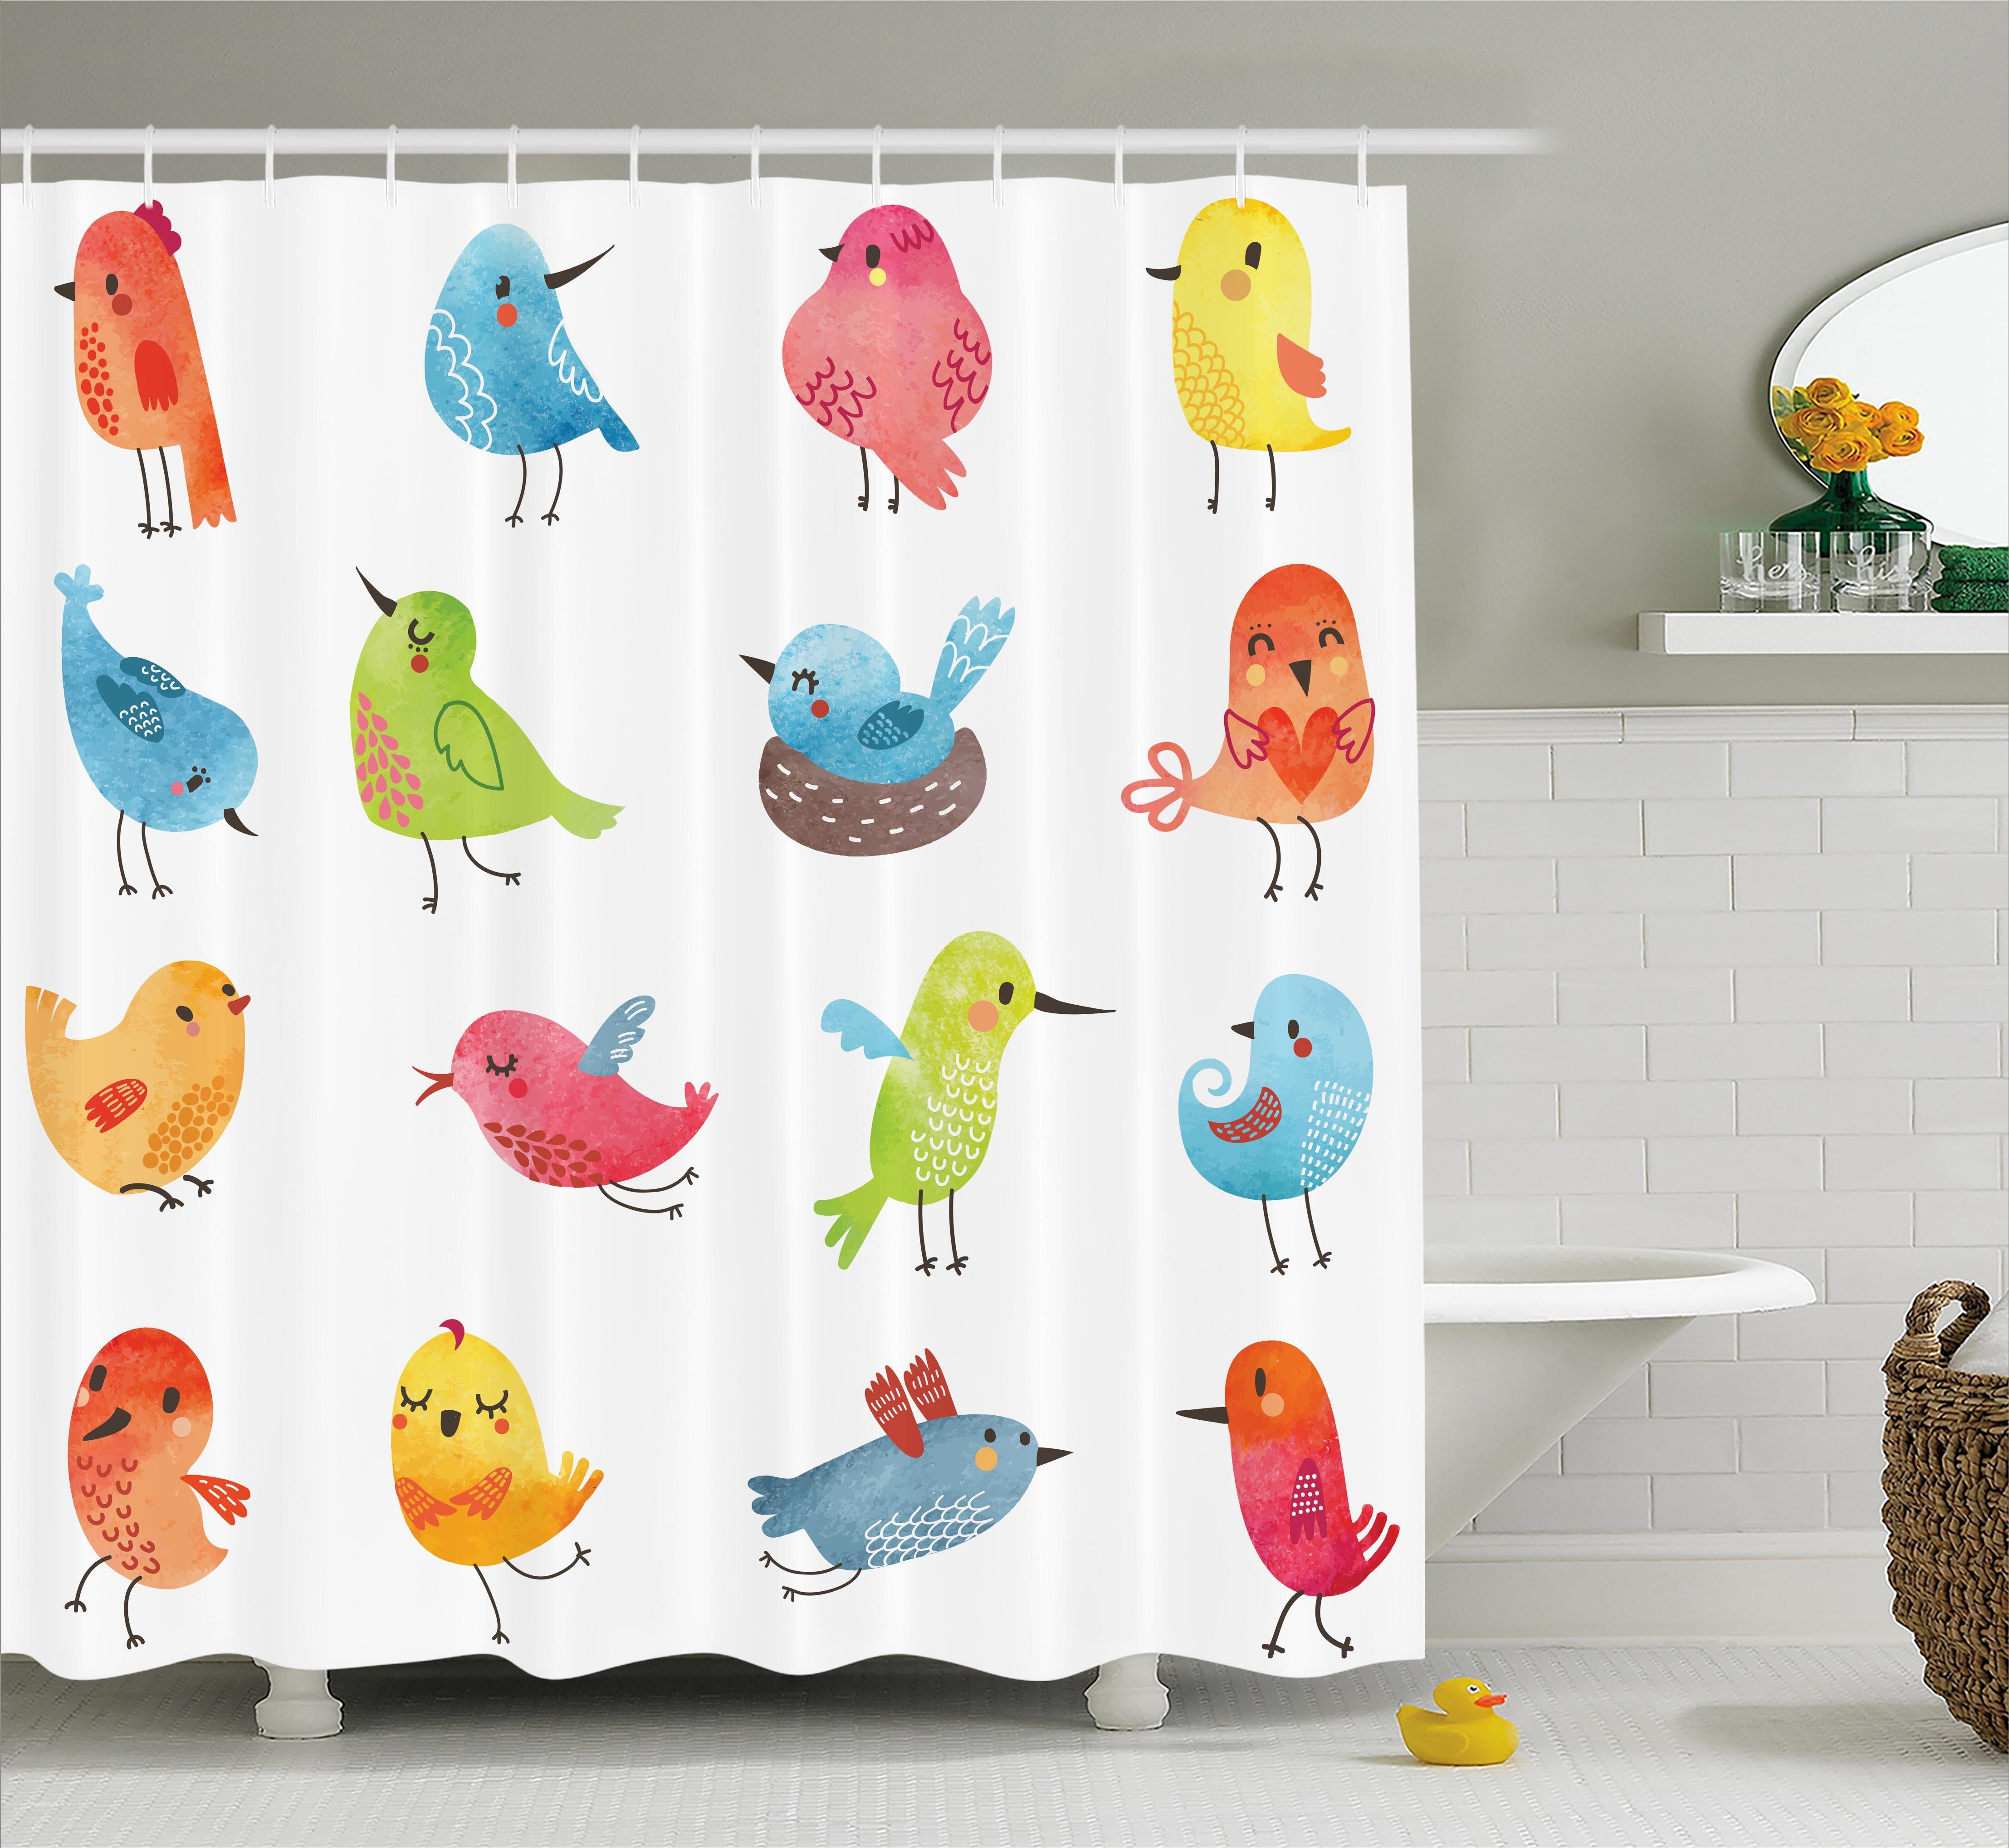 Zoomie Kids Lottie Colorful Cute Humor Bird Shower Curtain